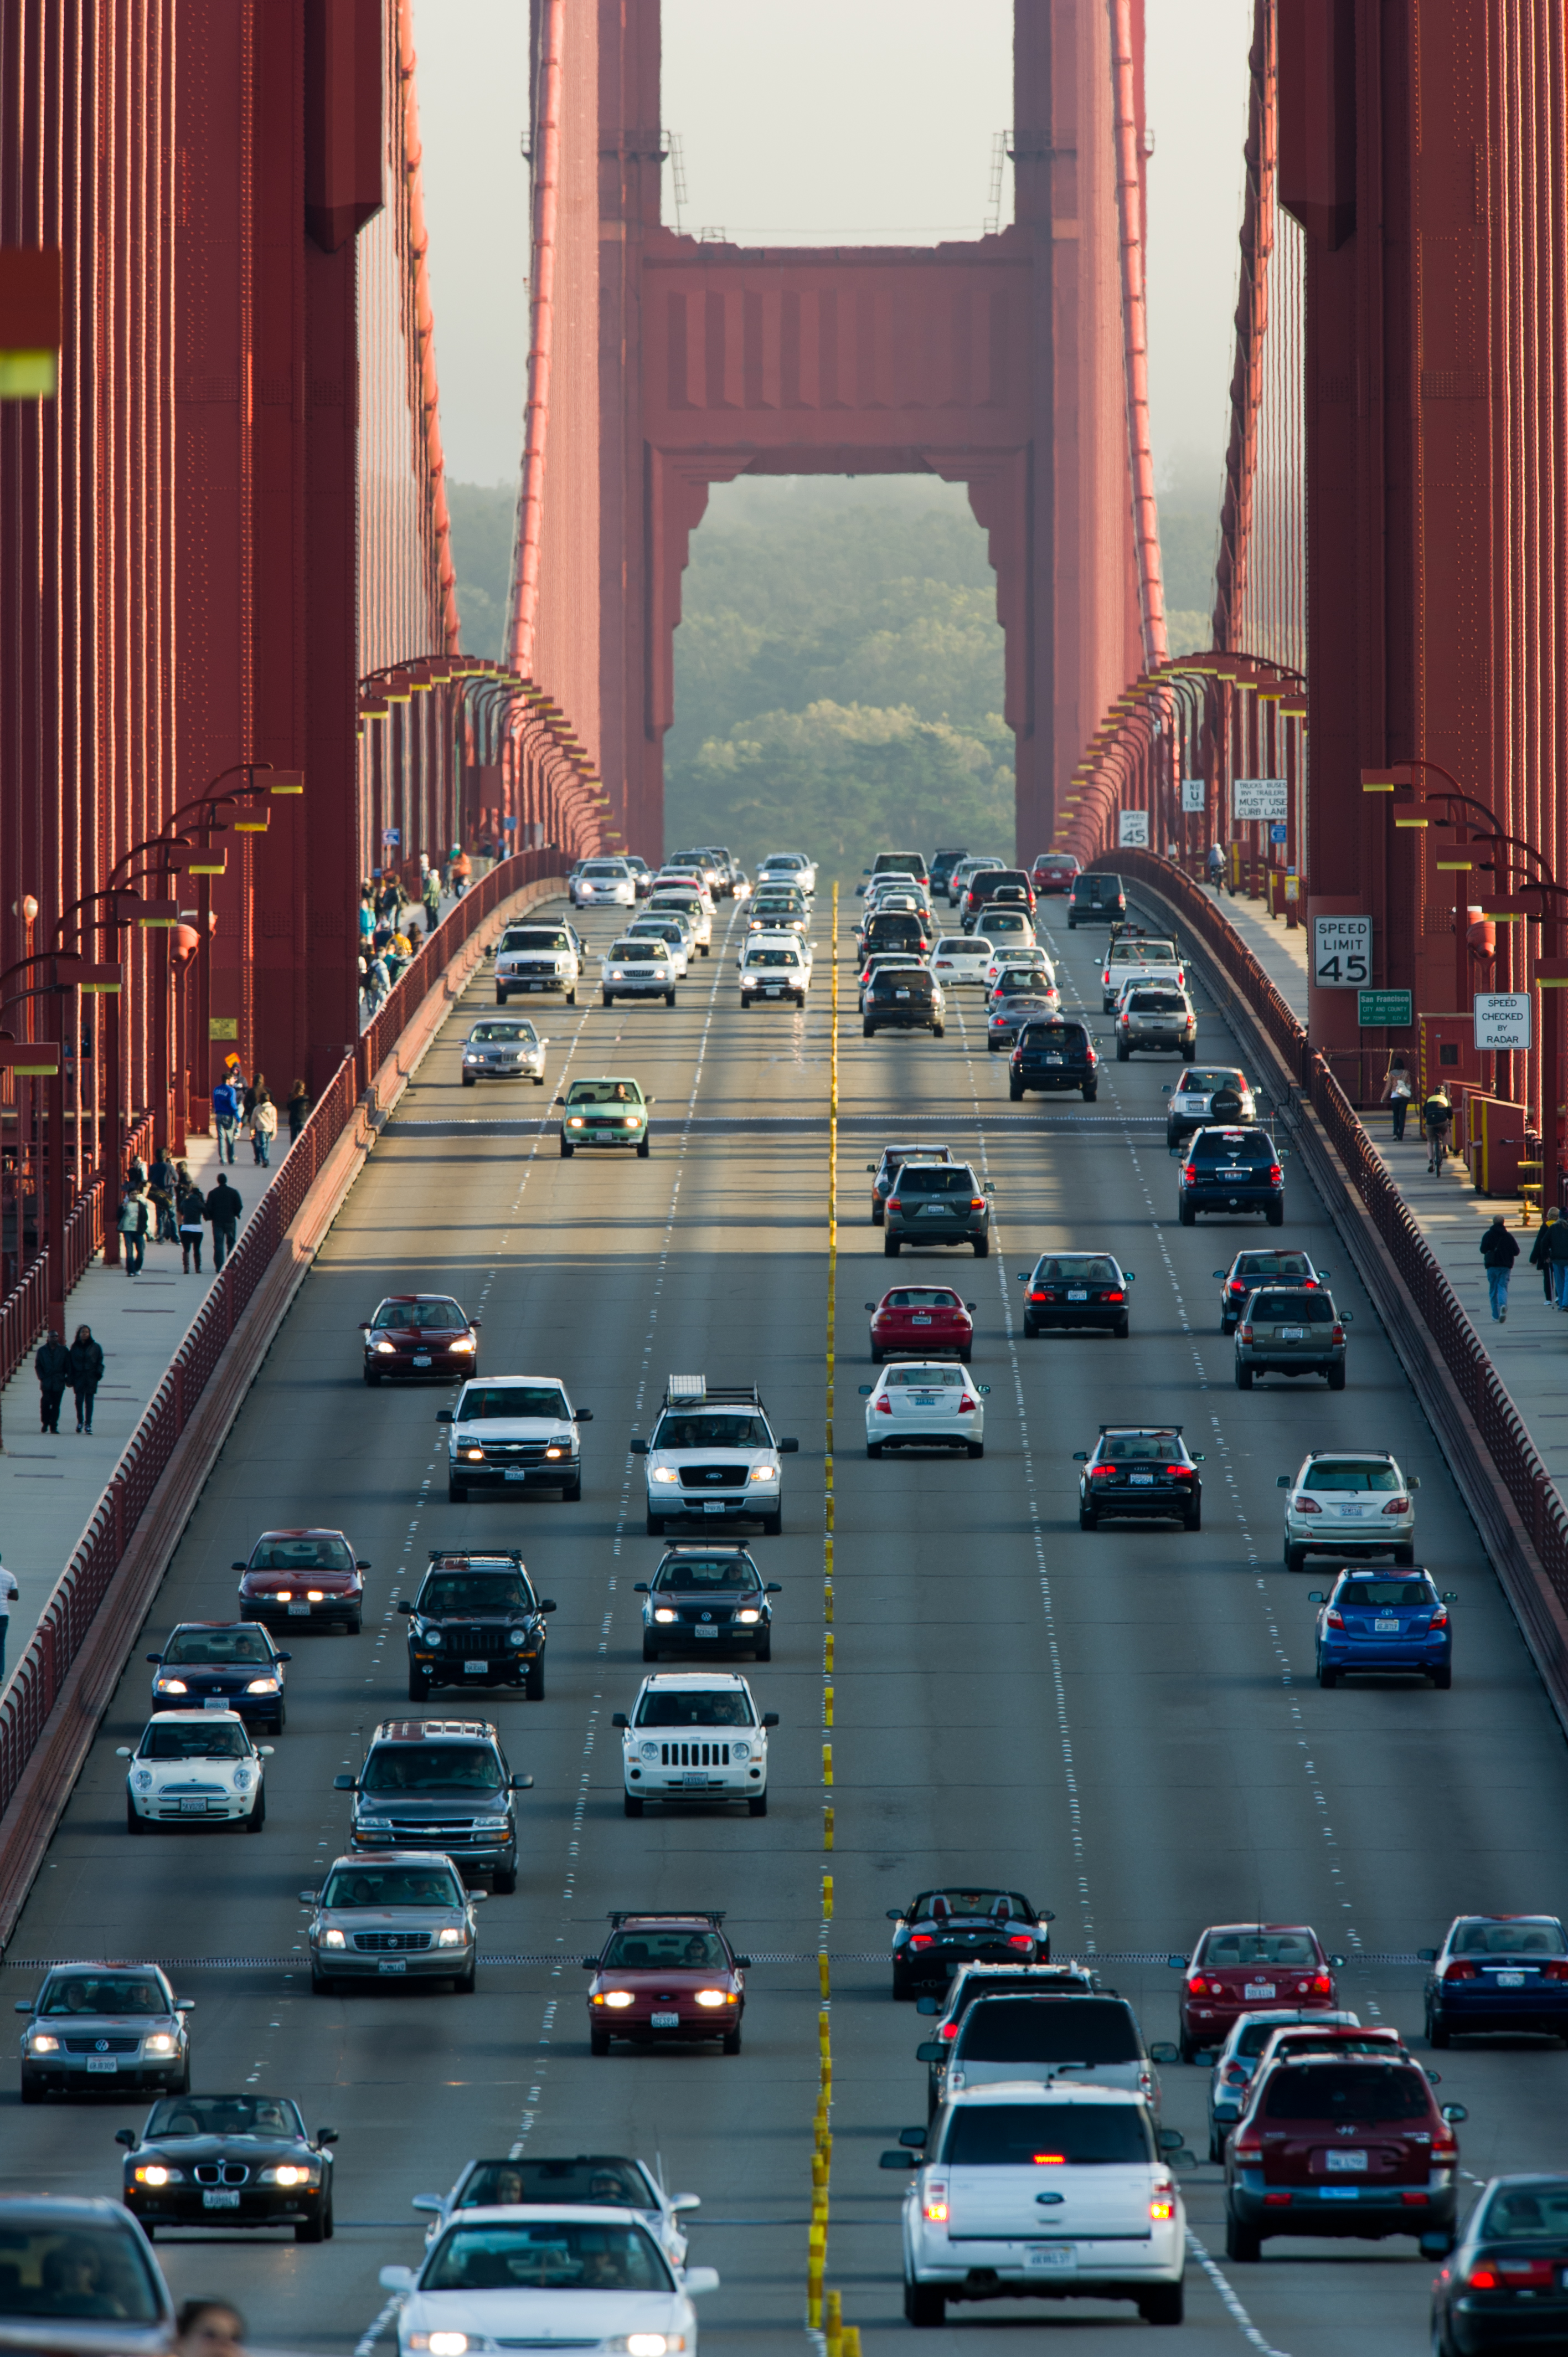 "Golden Gate Bridge traffic.  ""Golden Gate Bridge SF CA North View"" by Bill Ebbesen. Licensed under CC BY 2.5 via Wikimedia Commons."